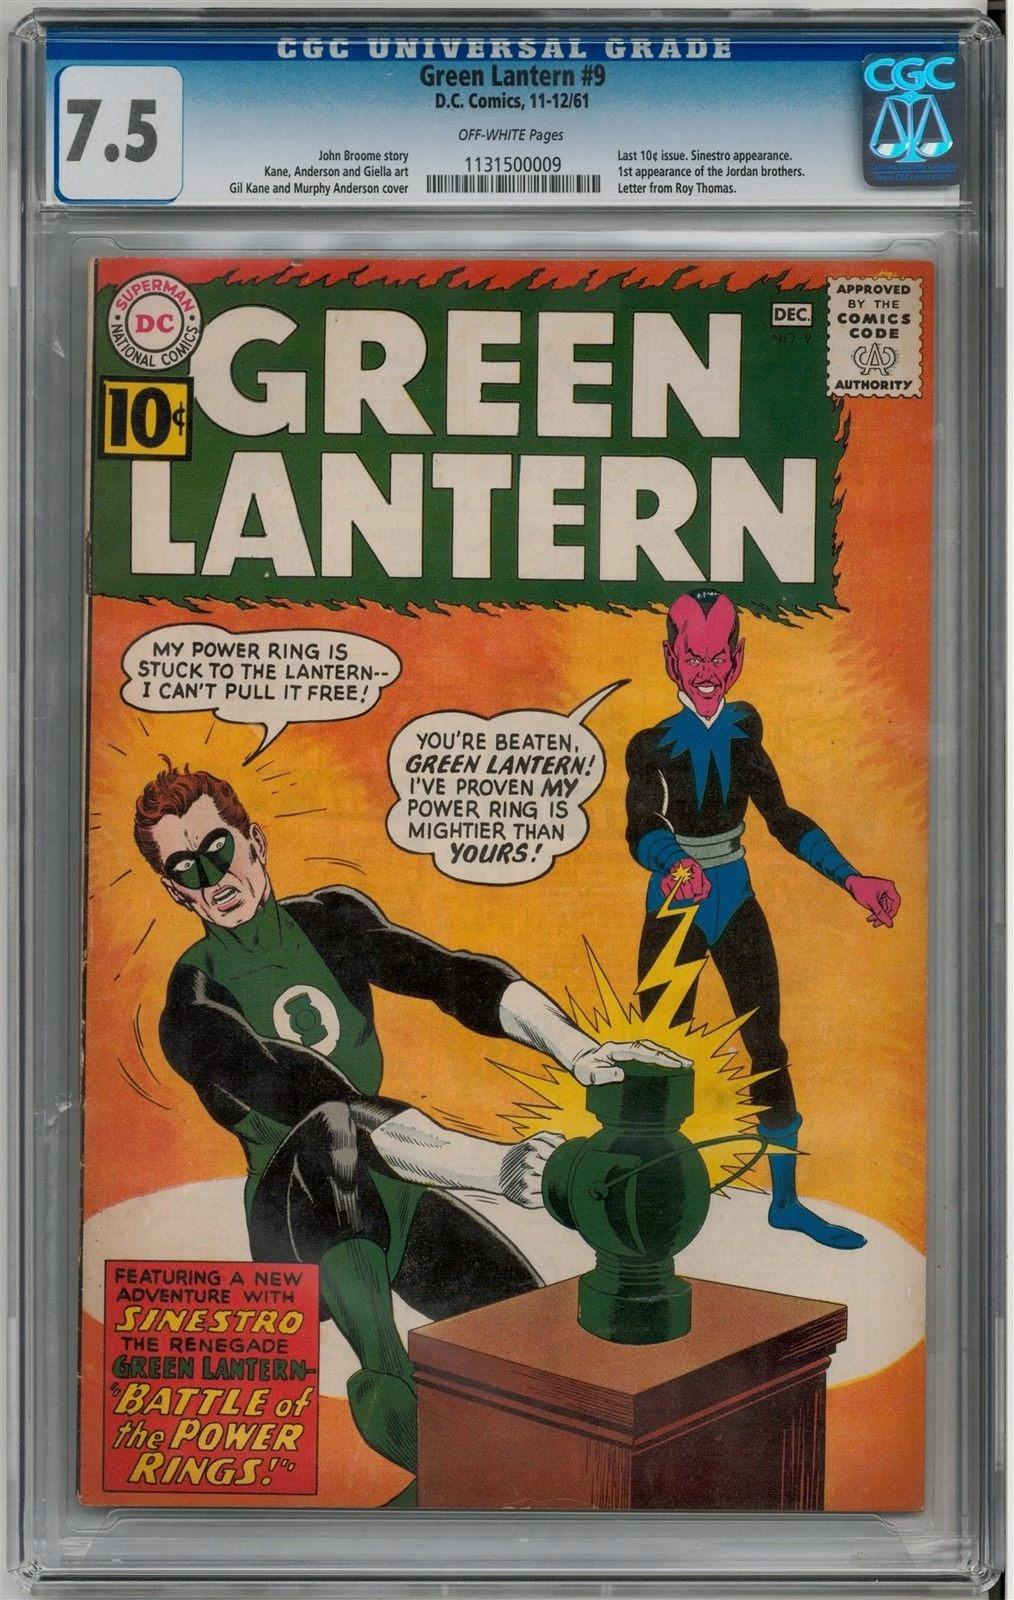 http://www.totalcomicmayhem.com/2015/02/green-lantern-9-cgc-75.html